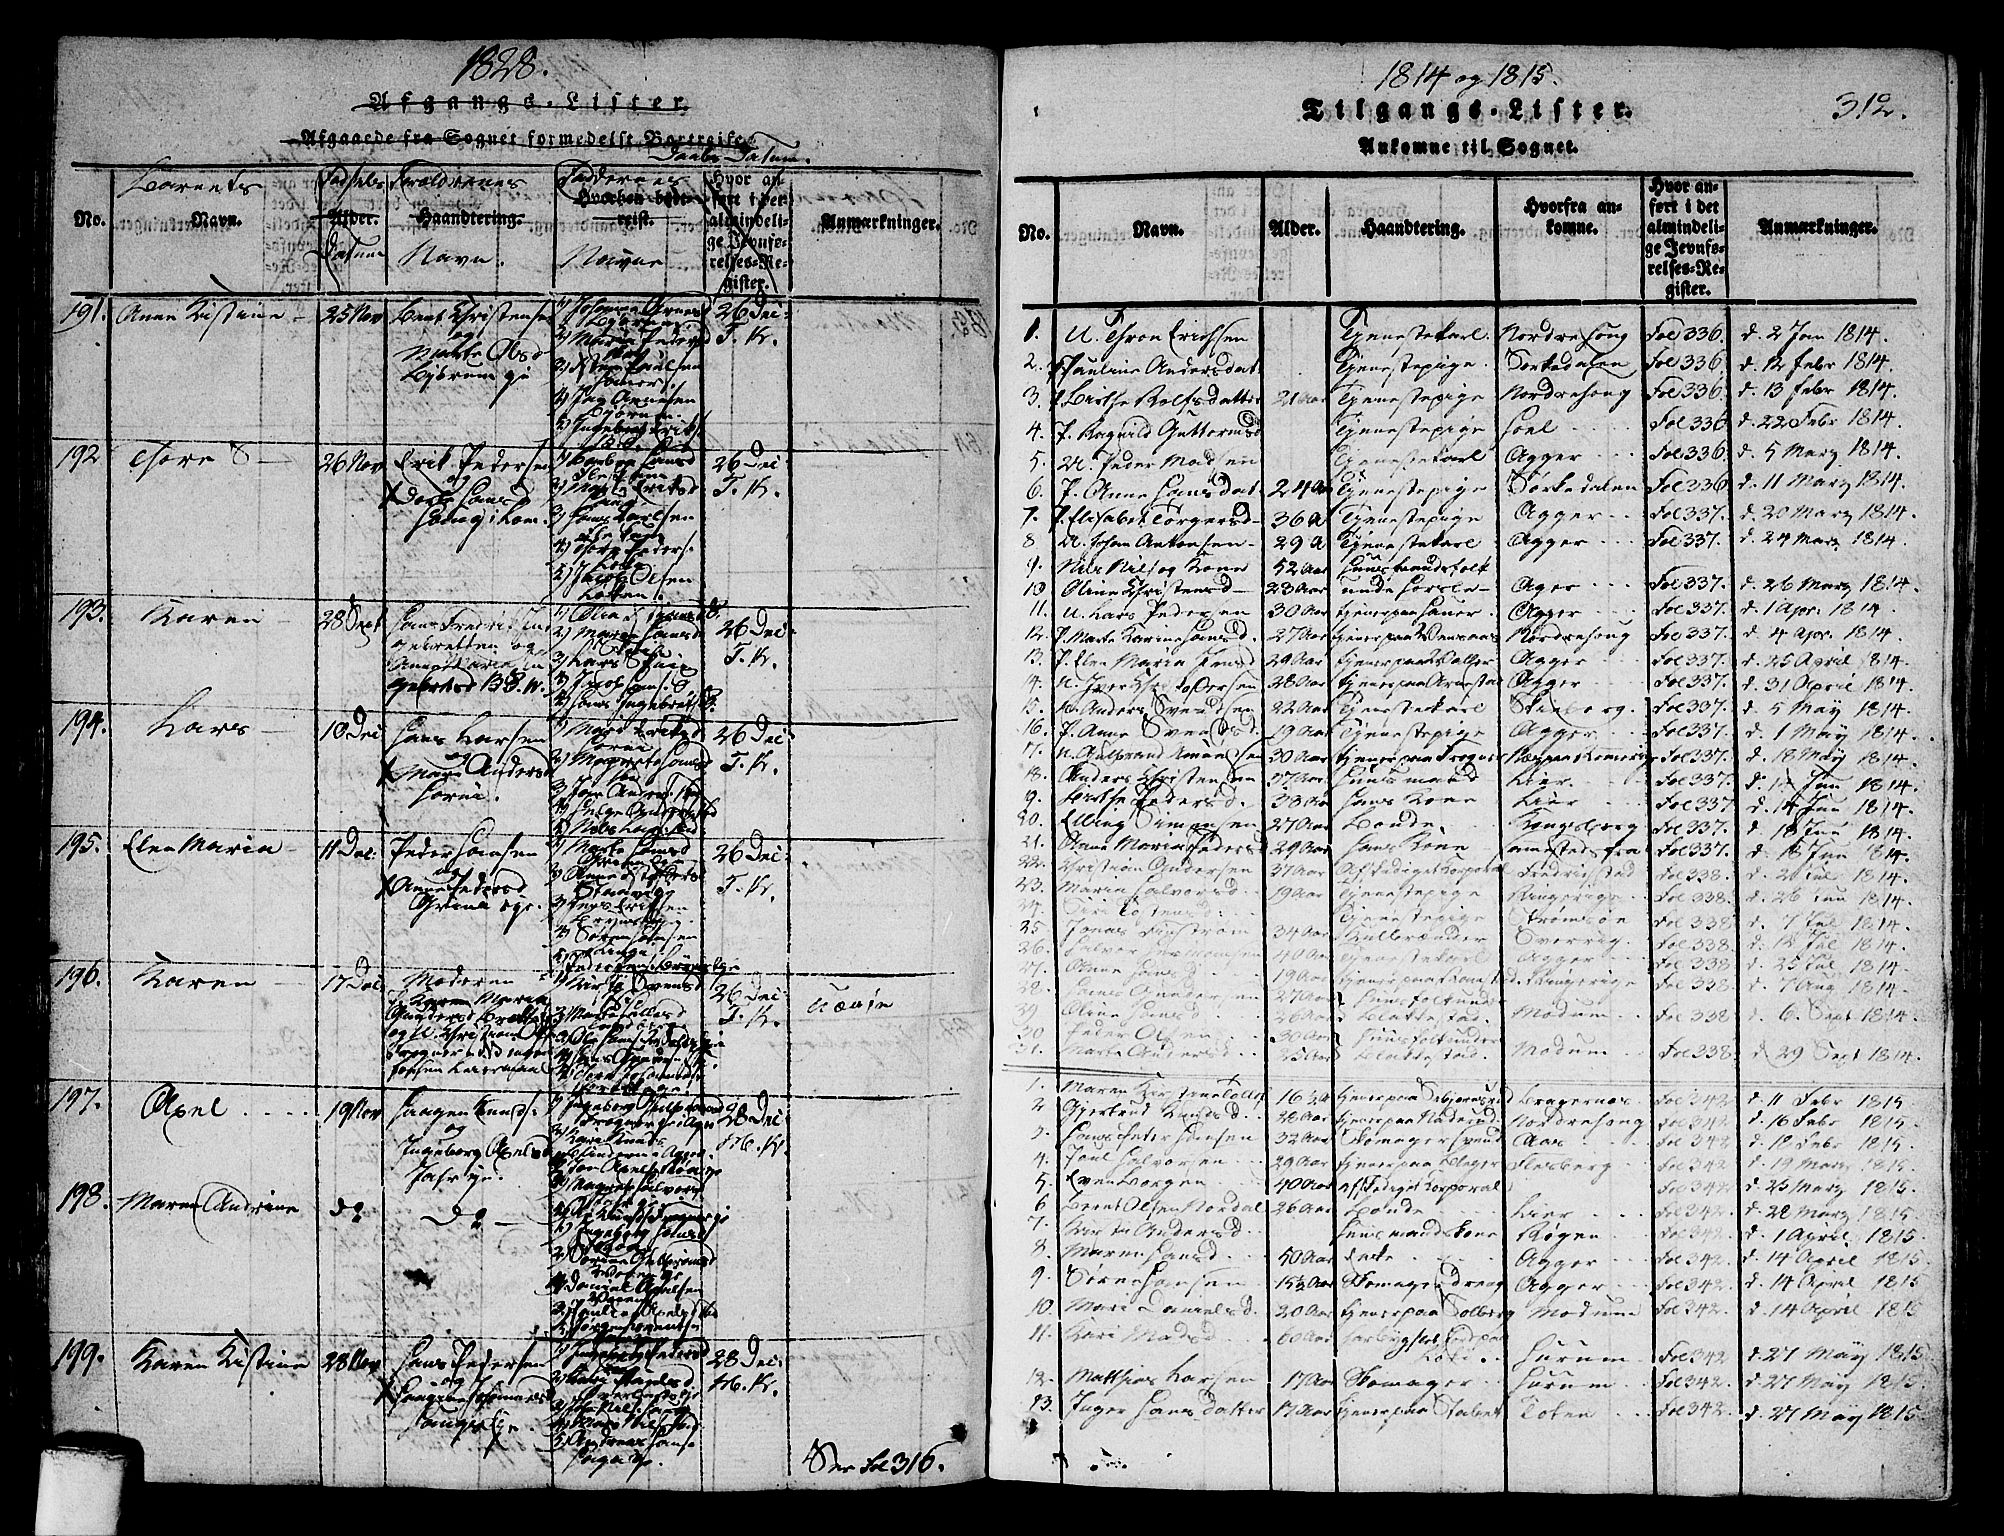 SAO, Asker prestekontor Kirkebøker, G/Ga/L0001: Klokkerbok nr. I 1, 1814-1830, s. 312